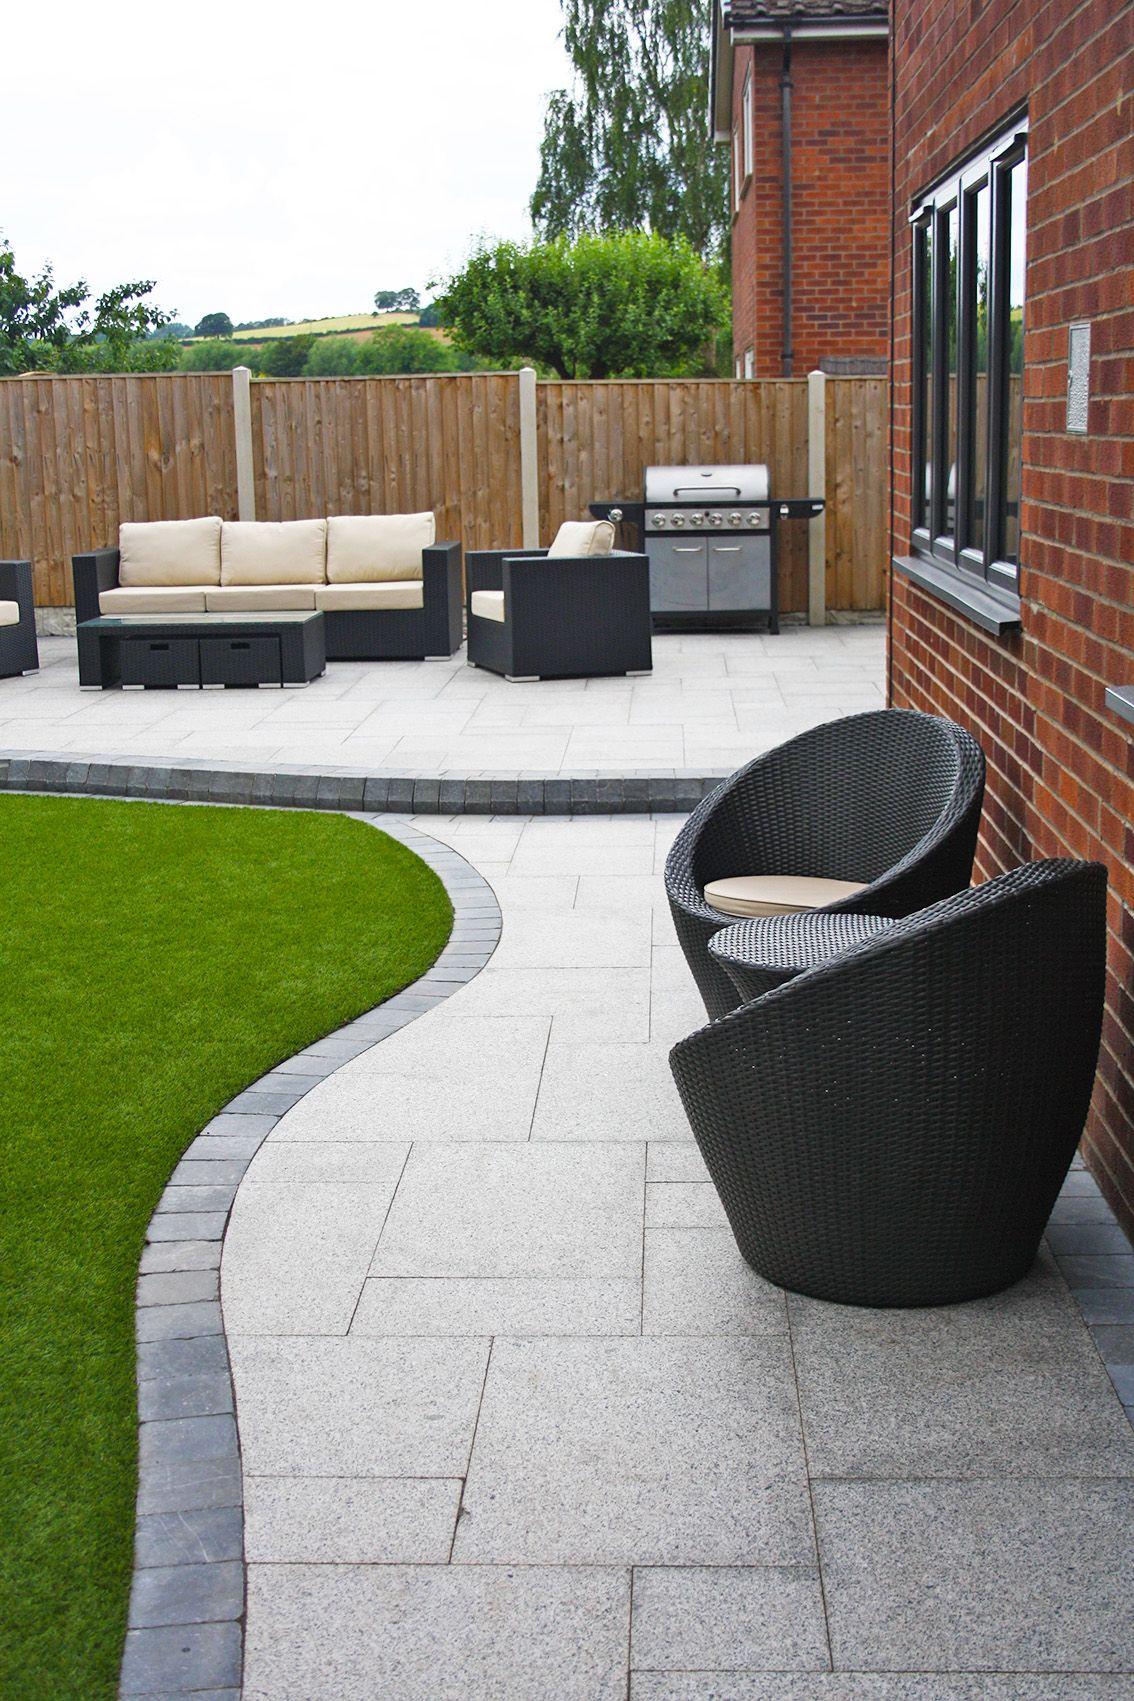 patio designs how to design and build a paver patio HMDNFZA